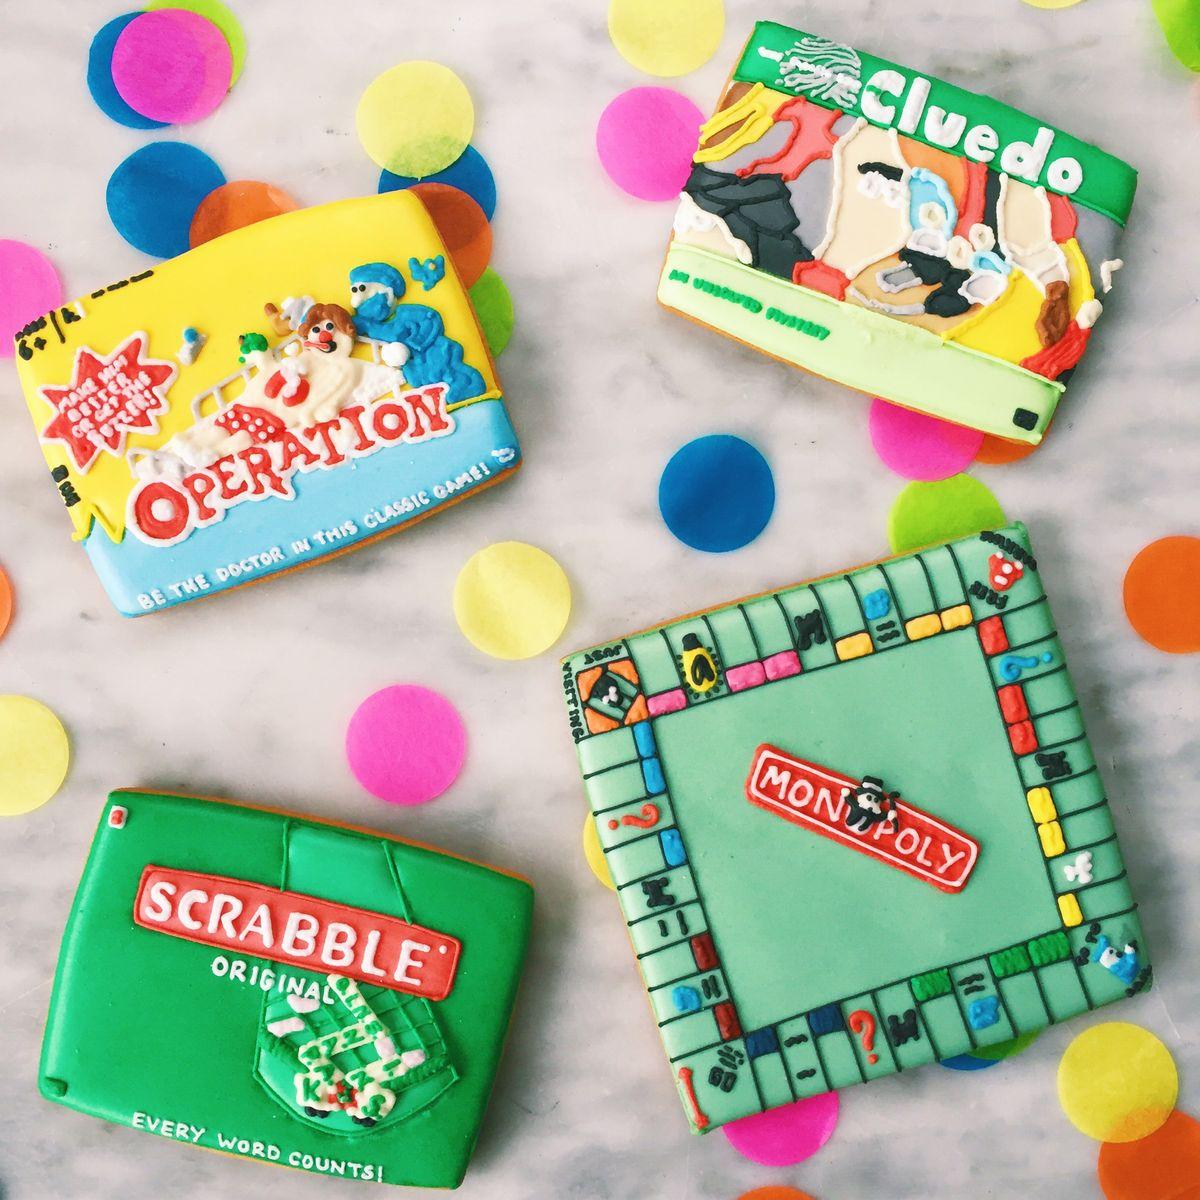 Board Game Biscuits by Biscuiteers